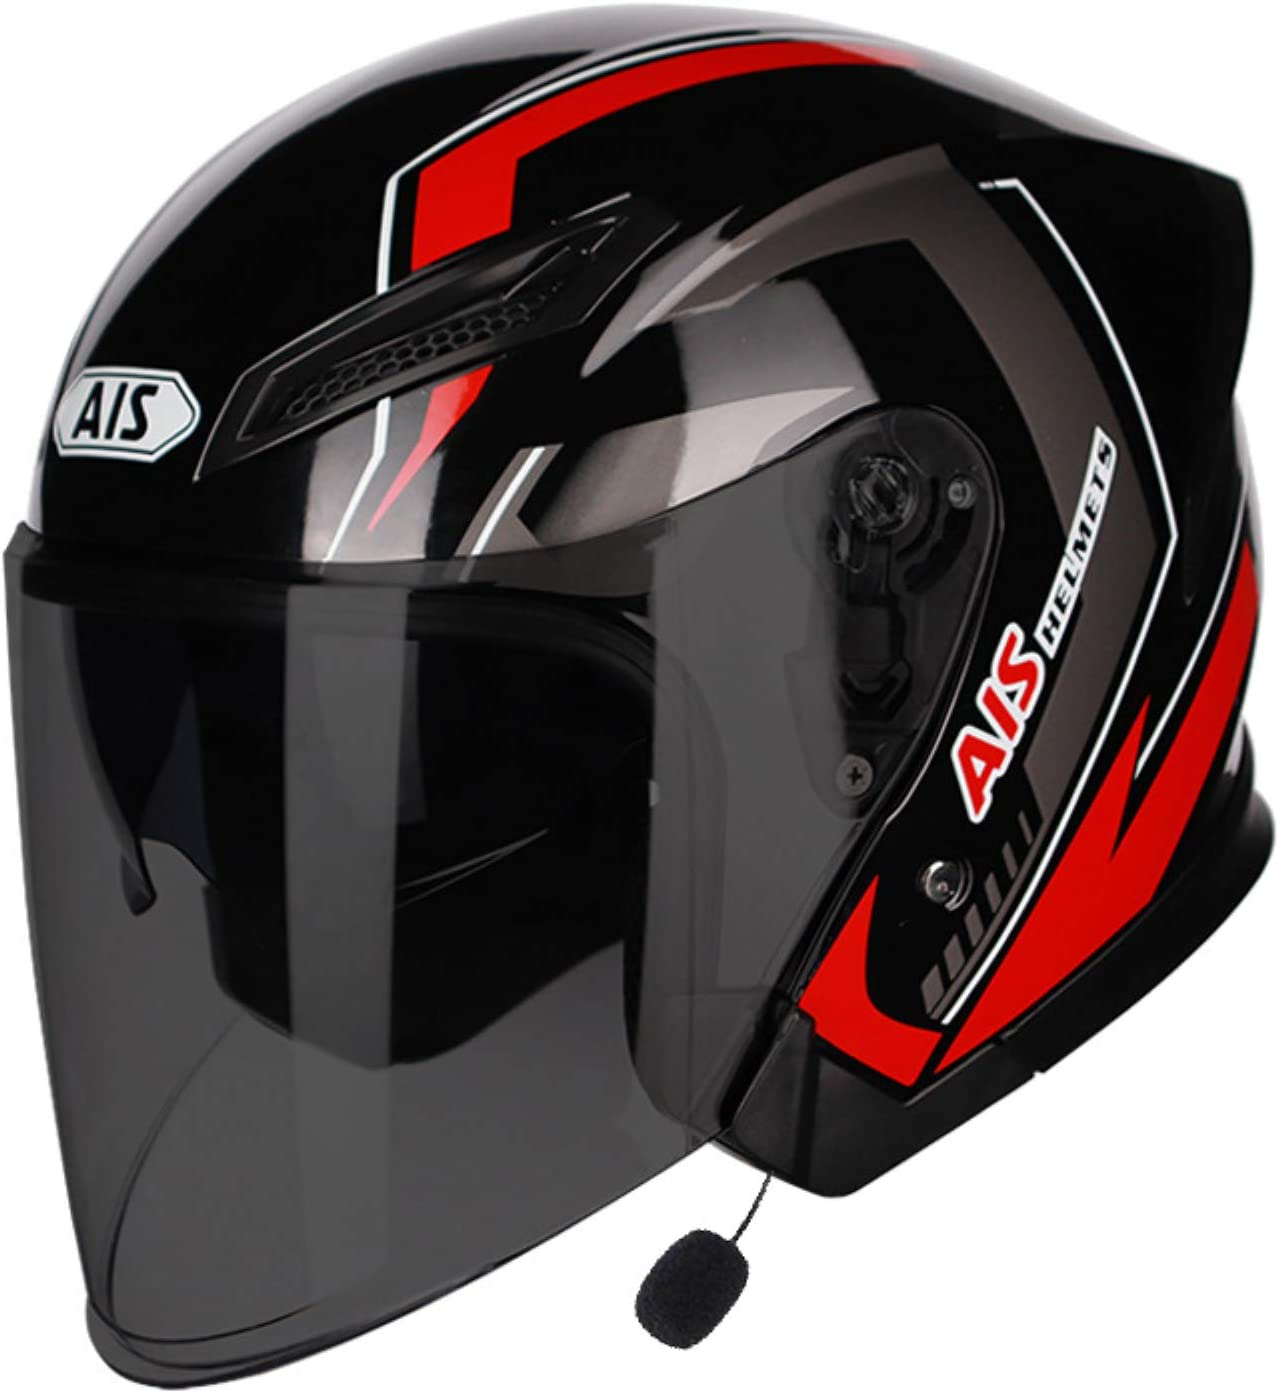 LICHUXIN Bluetooth de la Motocicleta Casco, Cubierta-Medio Casco de Bluetooth con micrófono, fácil de Limpiar, Ligero y Transpirable Casco de equitación, Unisex